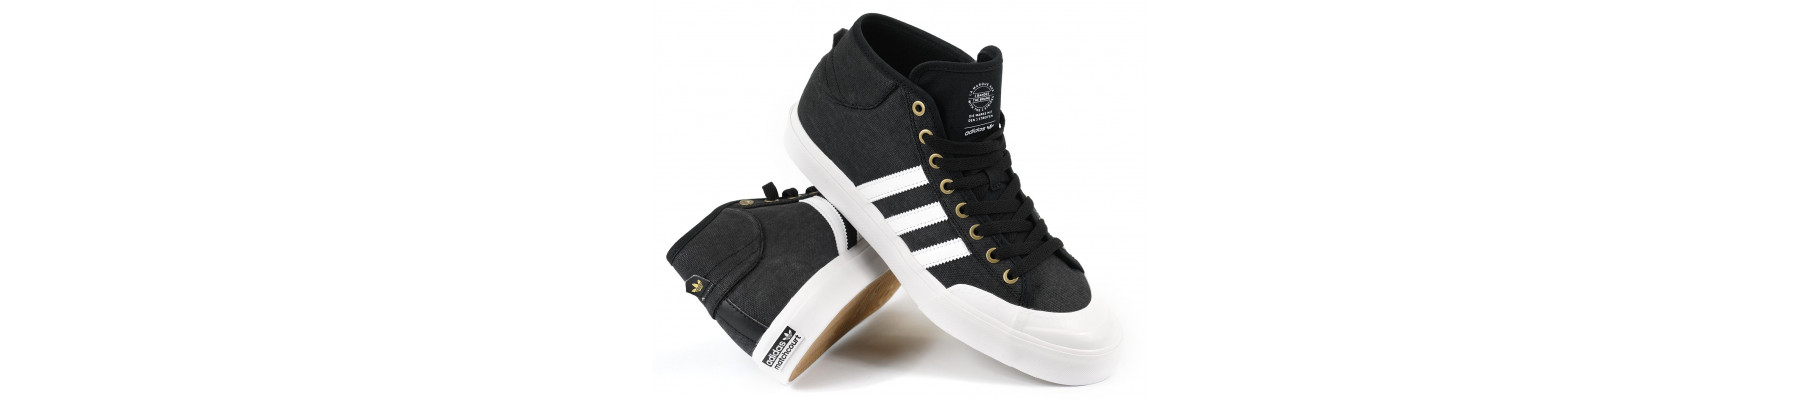 Adidas Matchcourt Mid Black Canvas